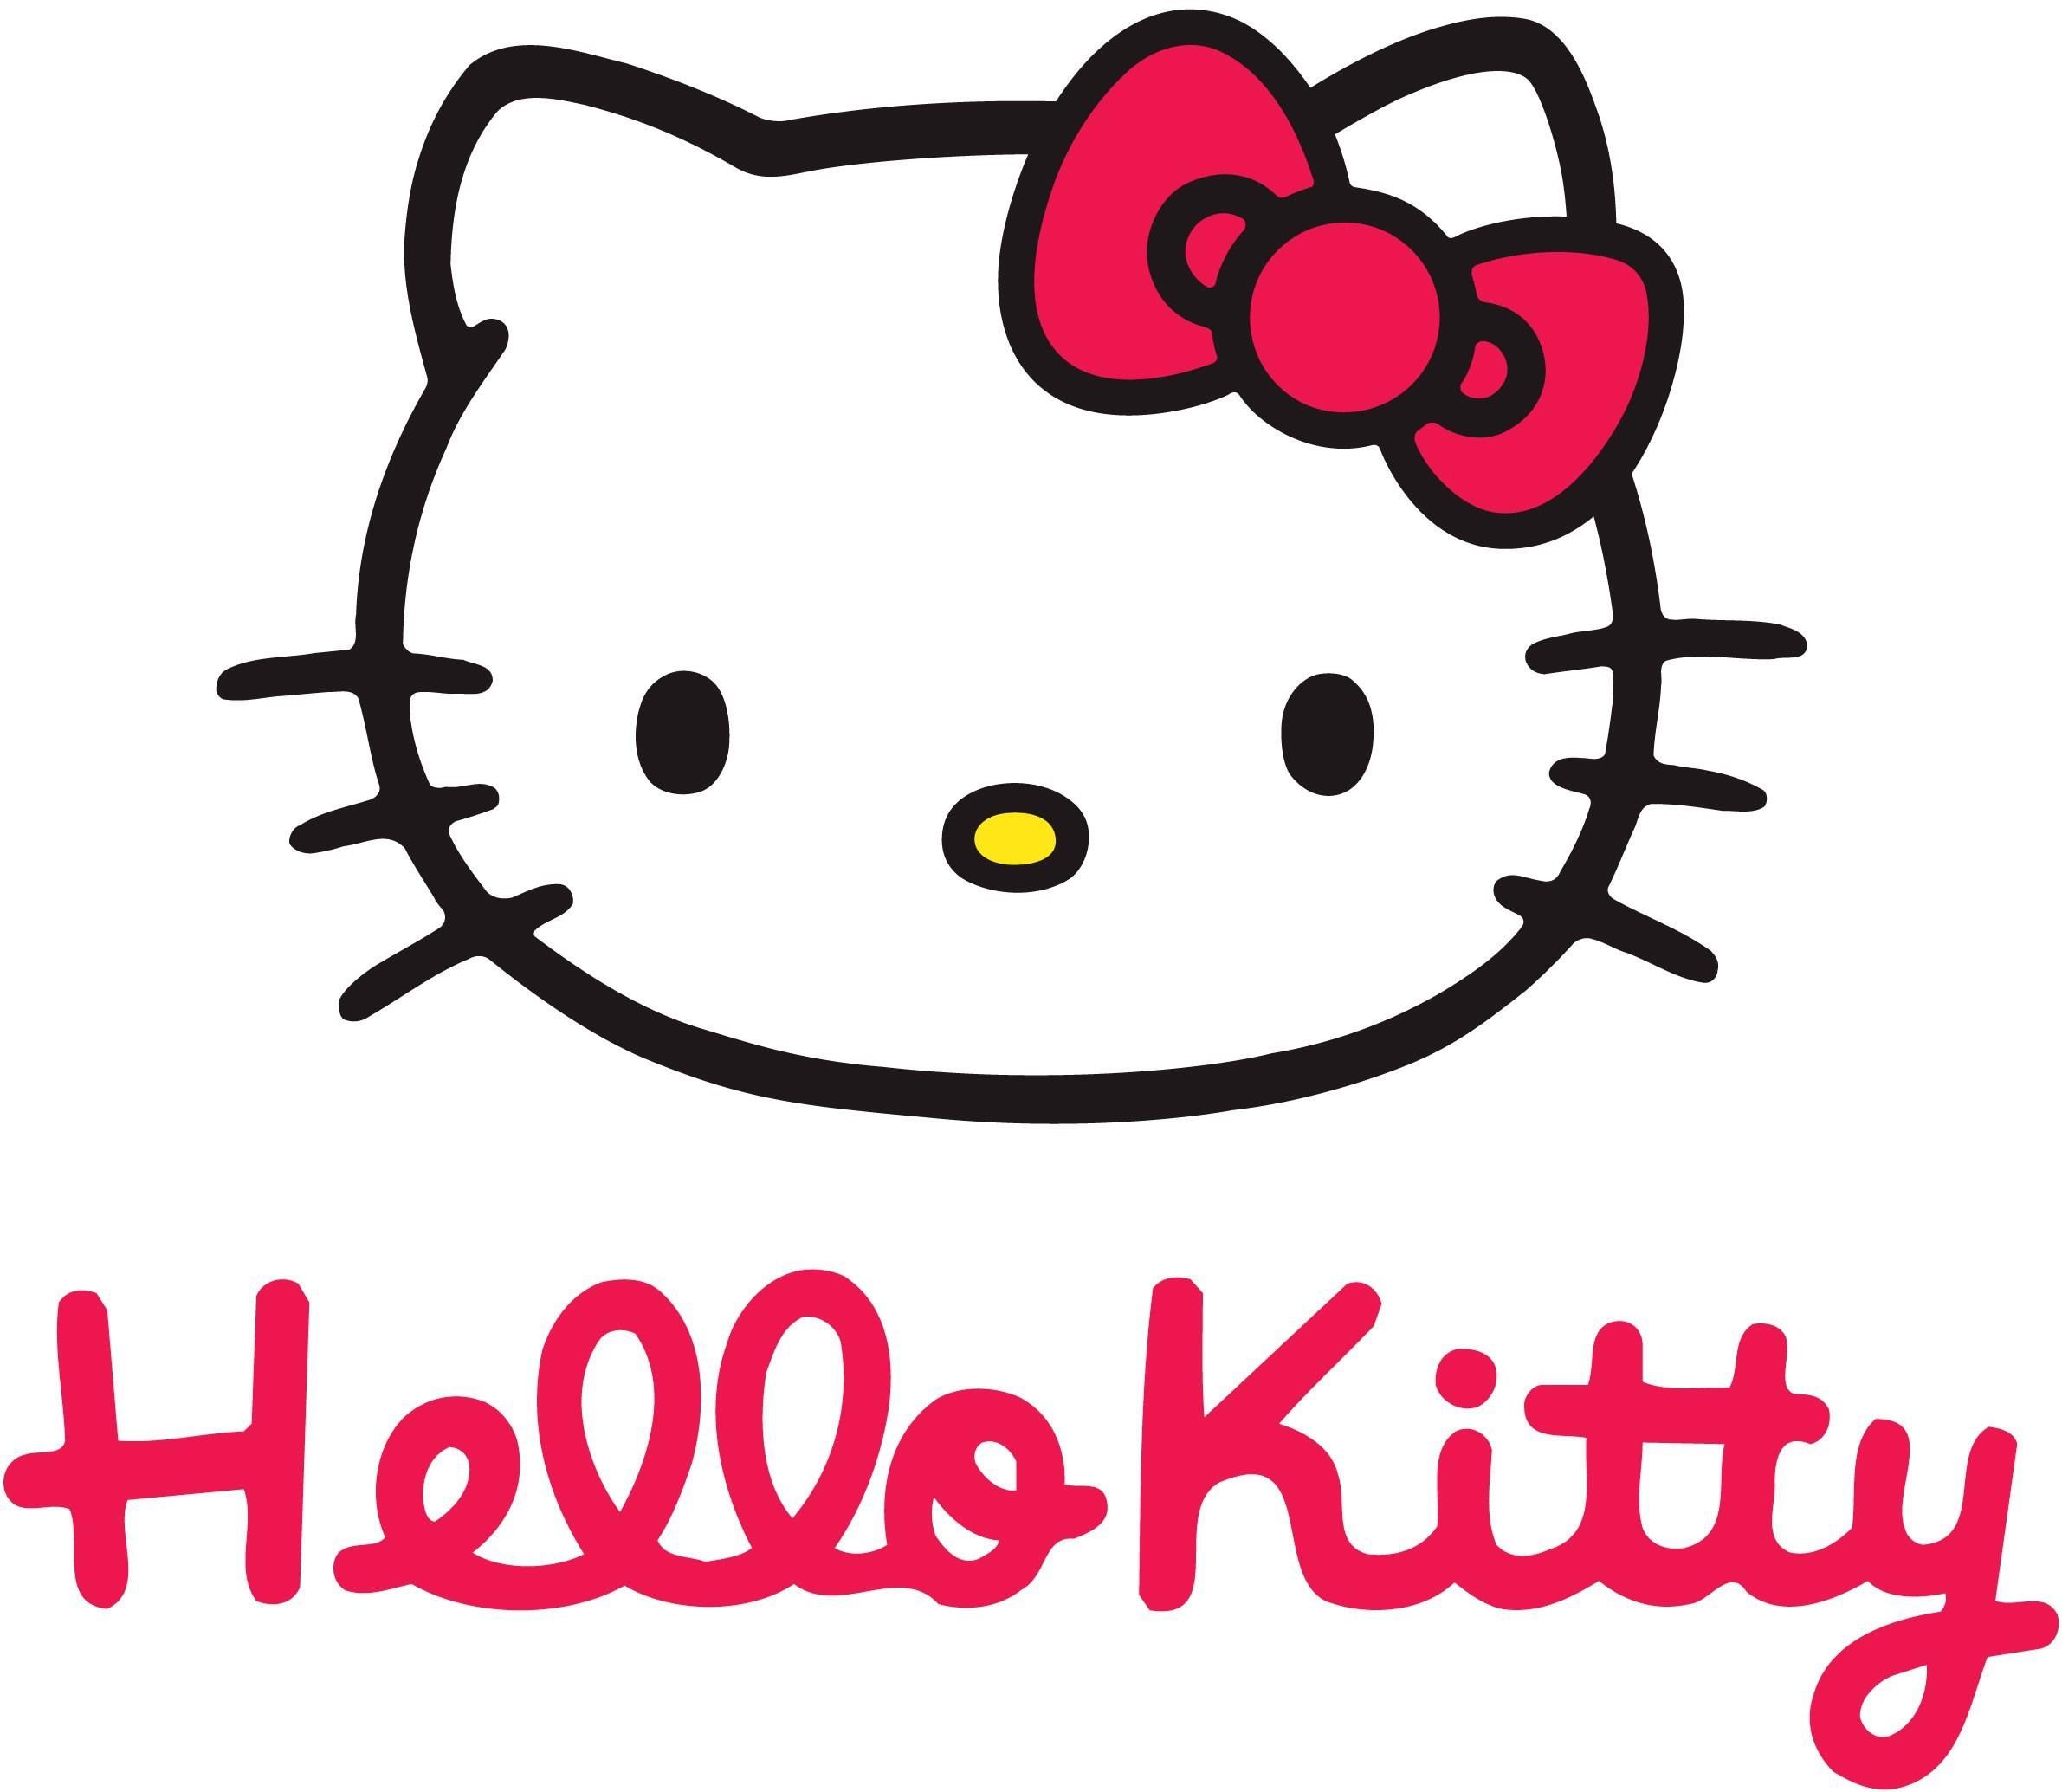 Simple Wallpaper Hello Kitty Desktop Background - 985038-hello-kitty-desktop-background-wallpapers-2381x2069-for-iphone-7  Collection_292718.jpg